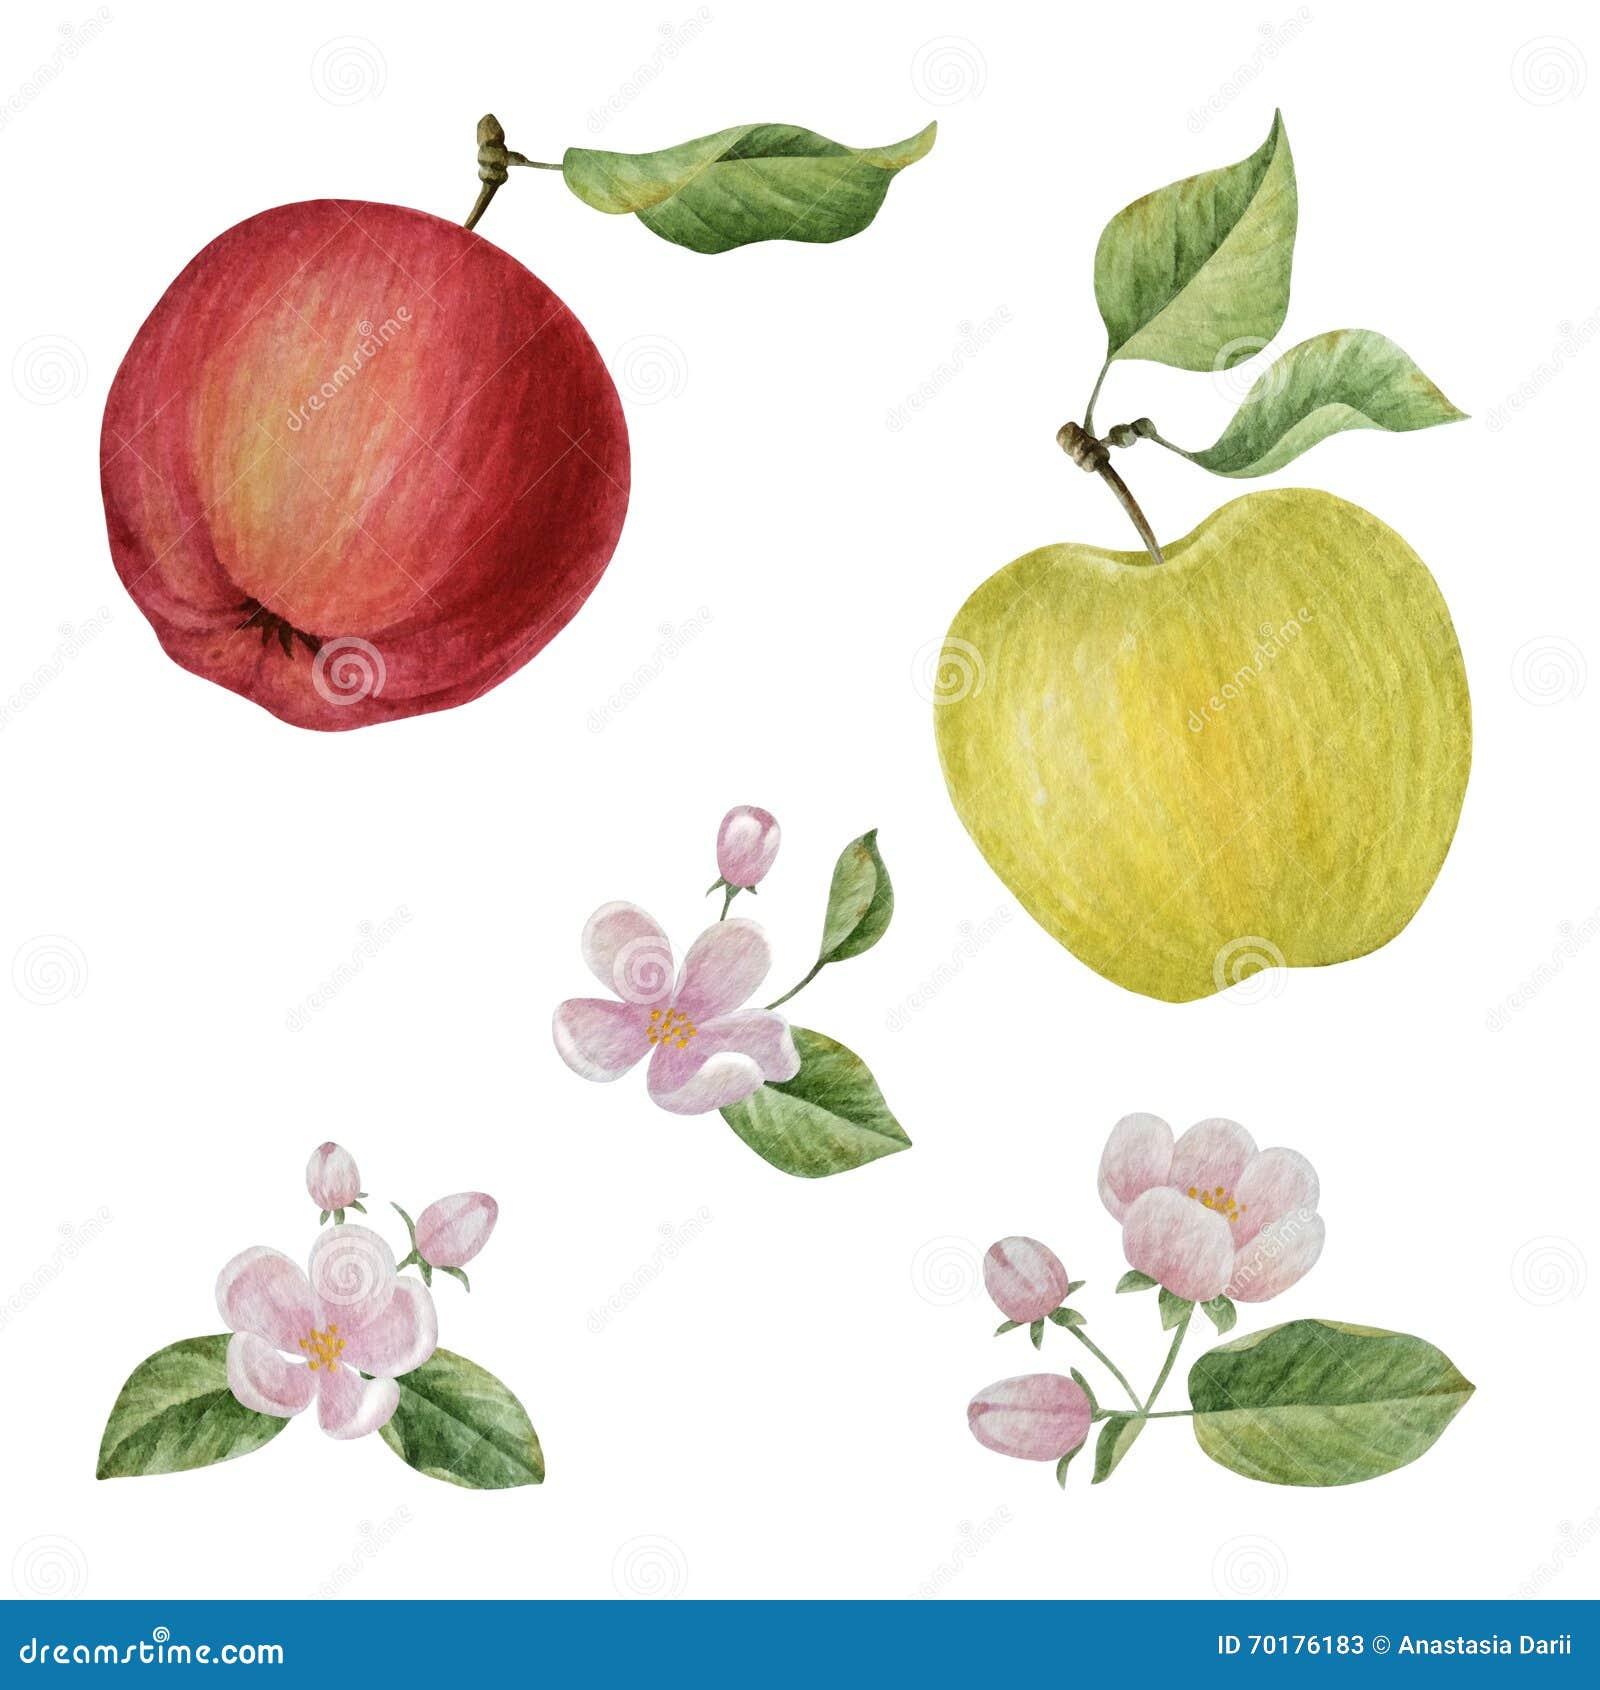 watercolor apple bloom flowers stock illustration illustration of